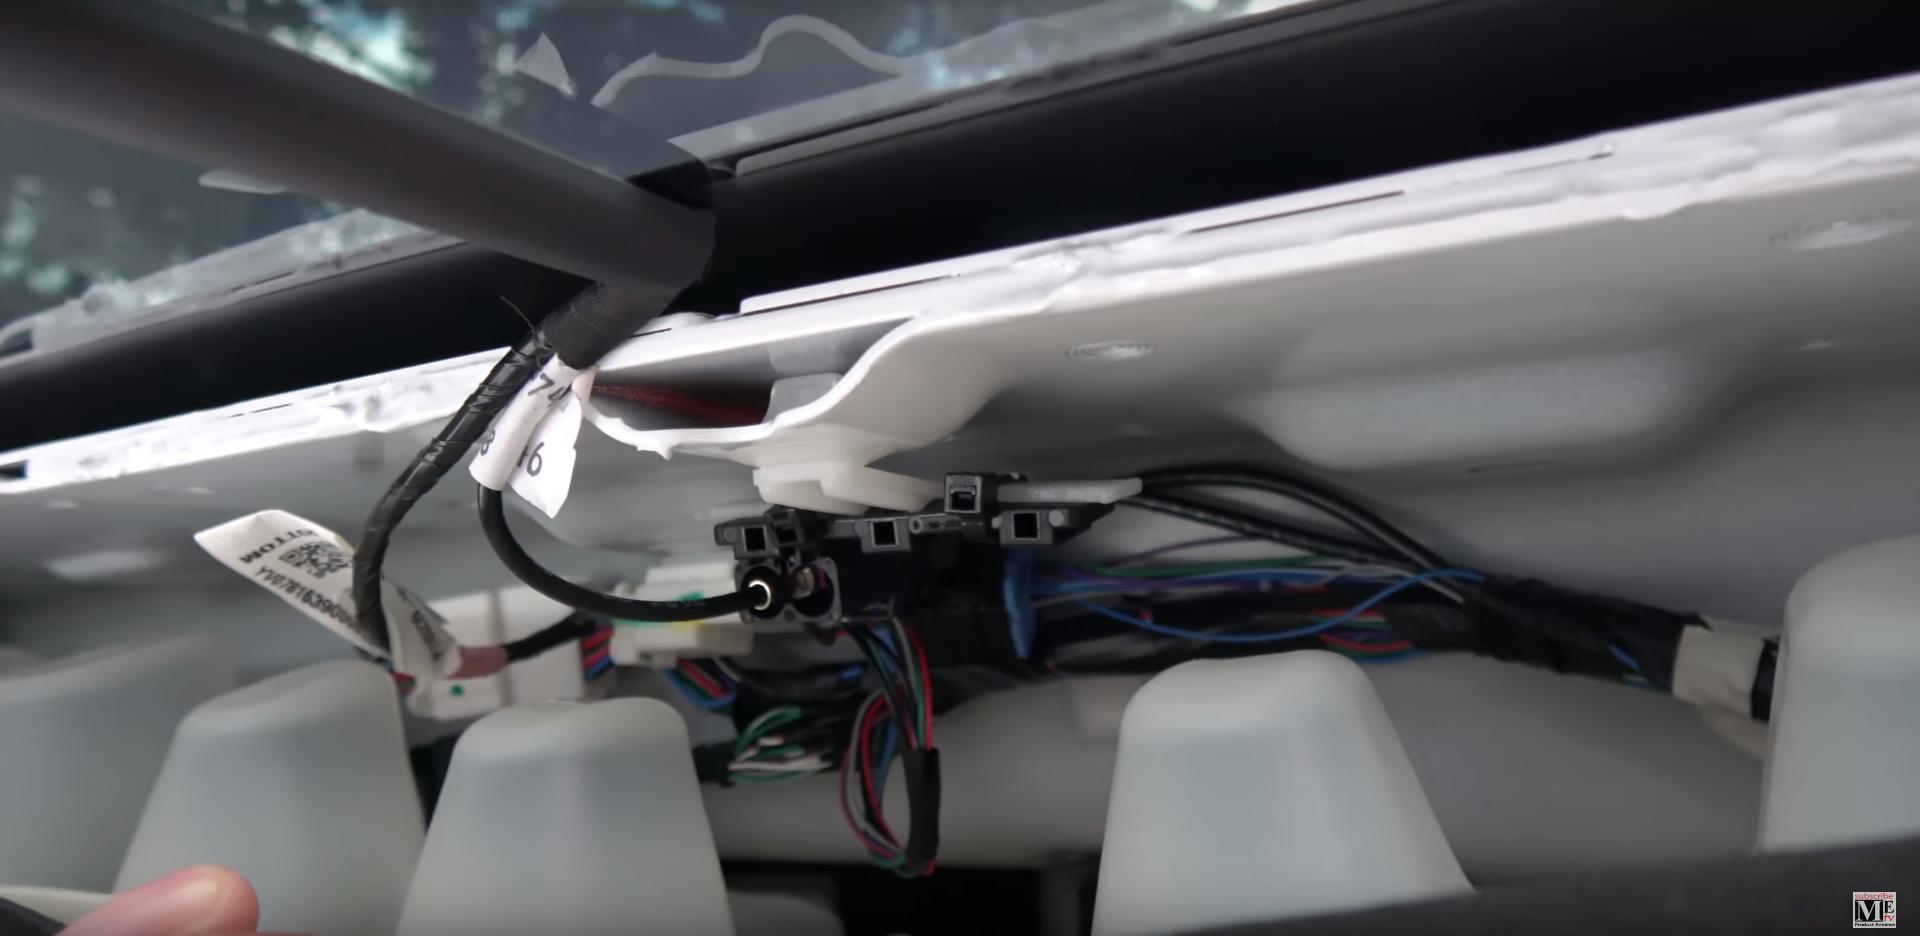 Tesla wiring harness model x